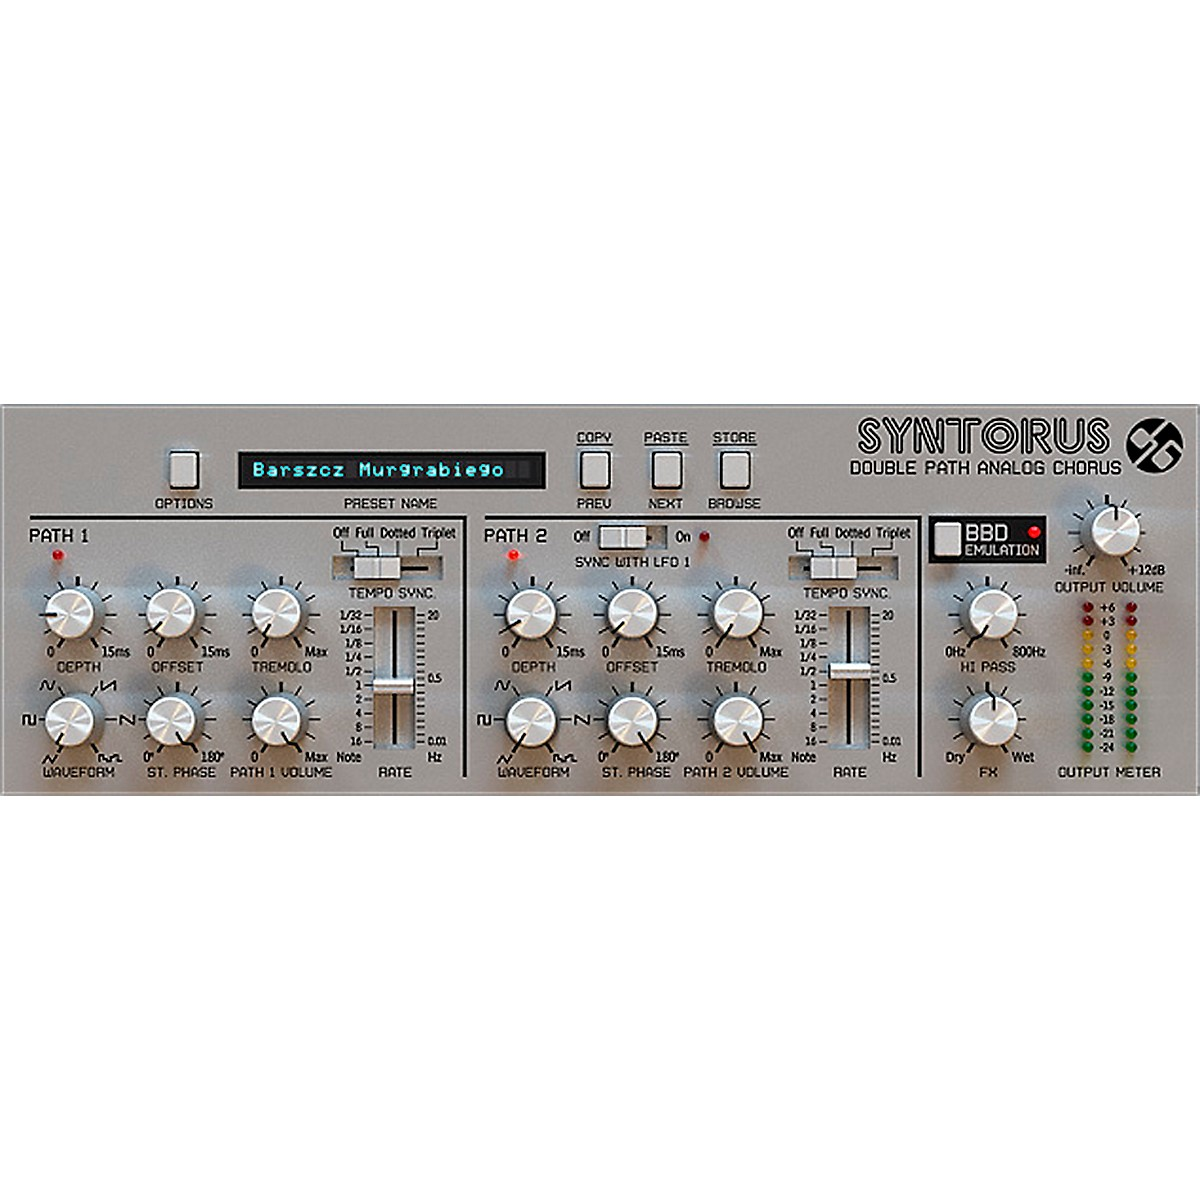 D16 Group Syntorus Double Path Analog Chorus (VST/AU) Software Download